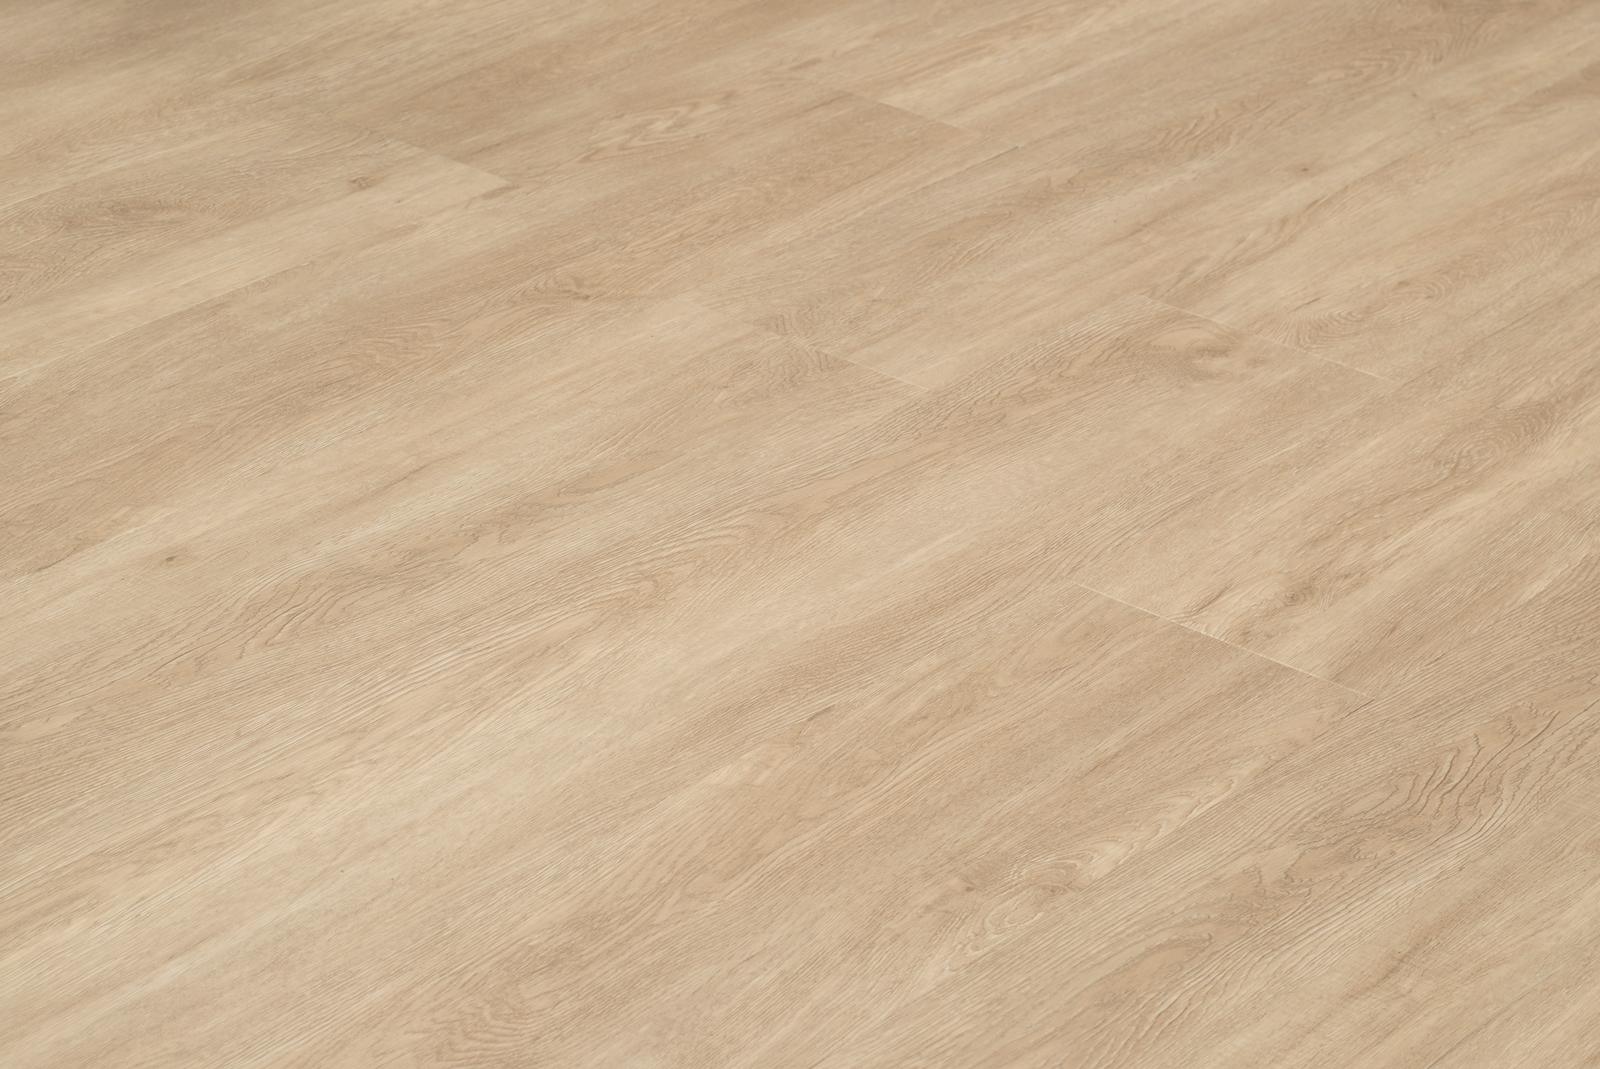 Floer stroken pvc vloer planken delfzijl white wash eiken breed